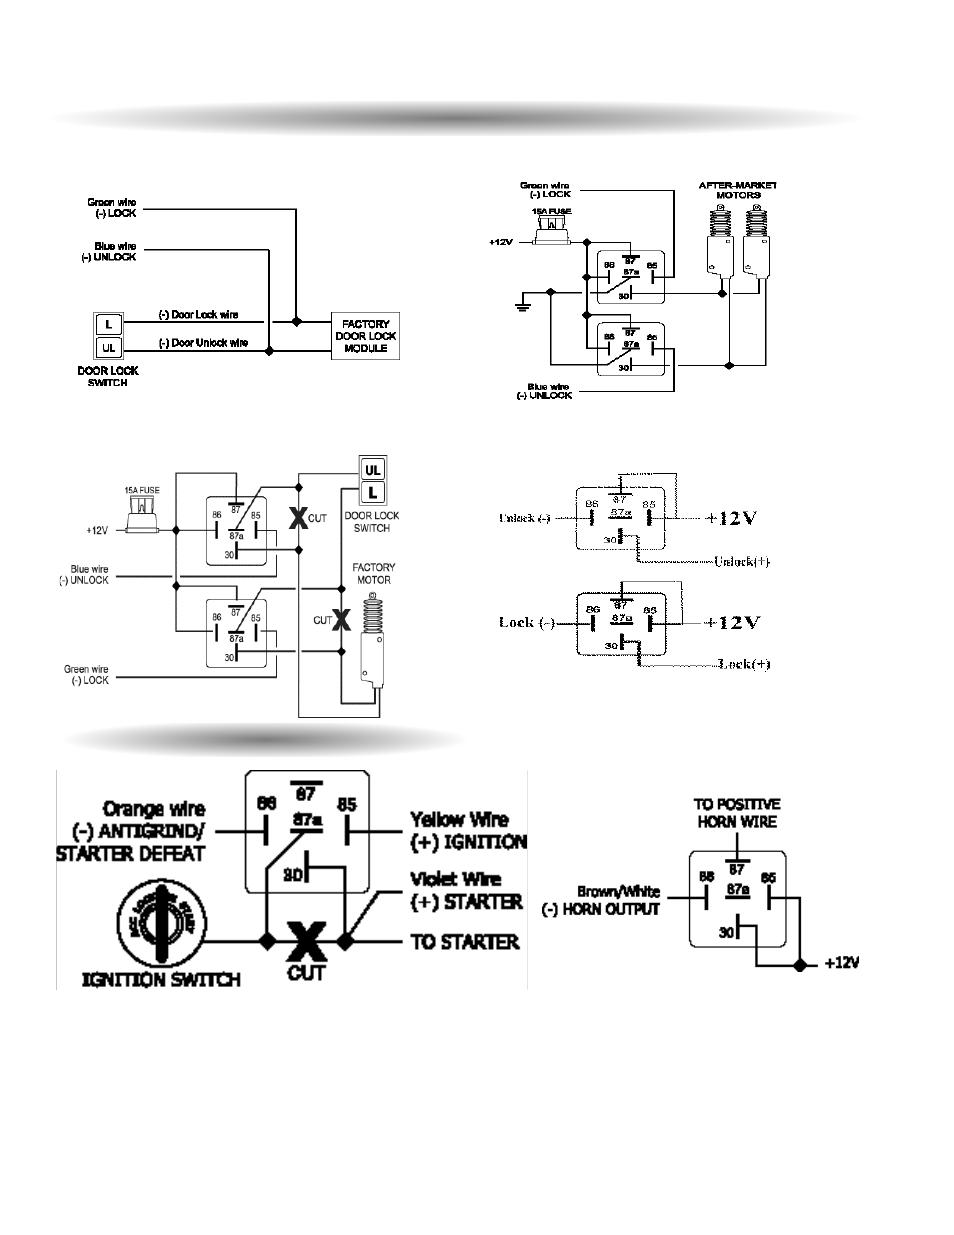 scytek schematic door lock diagrams, starter interrupt | scytek electronics g20 user manual | page 11 / 12  #5